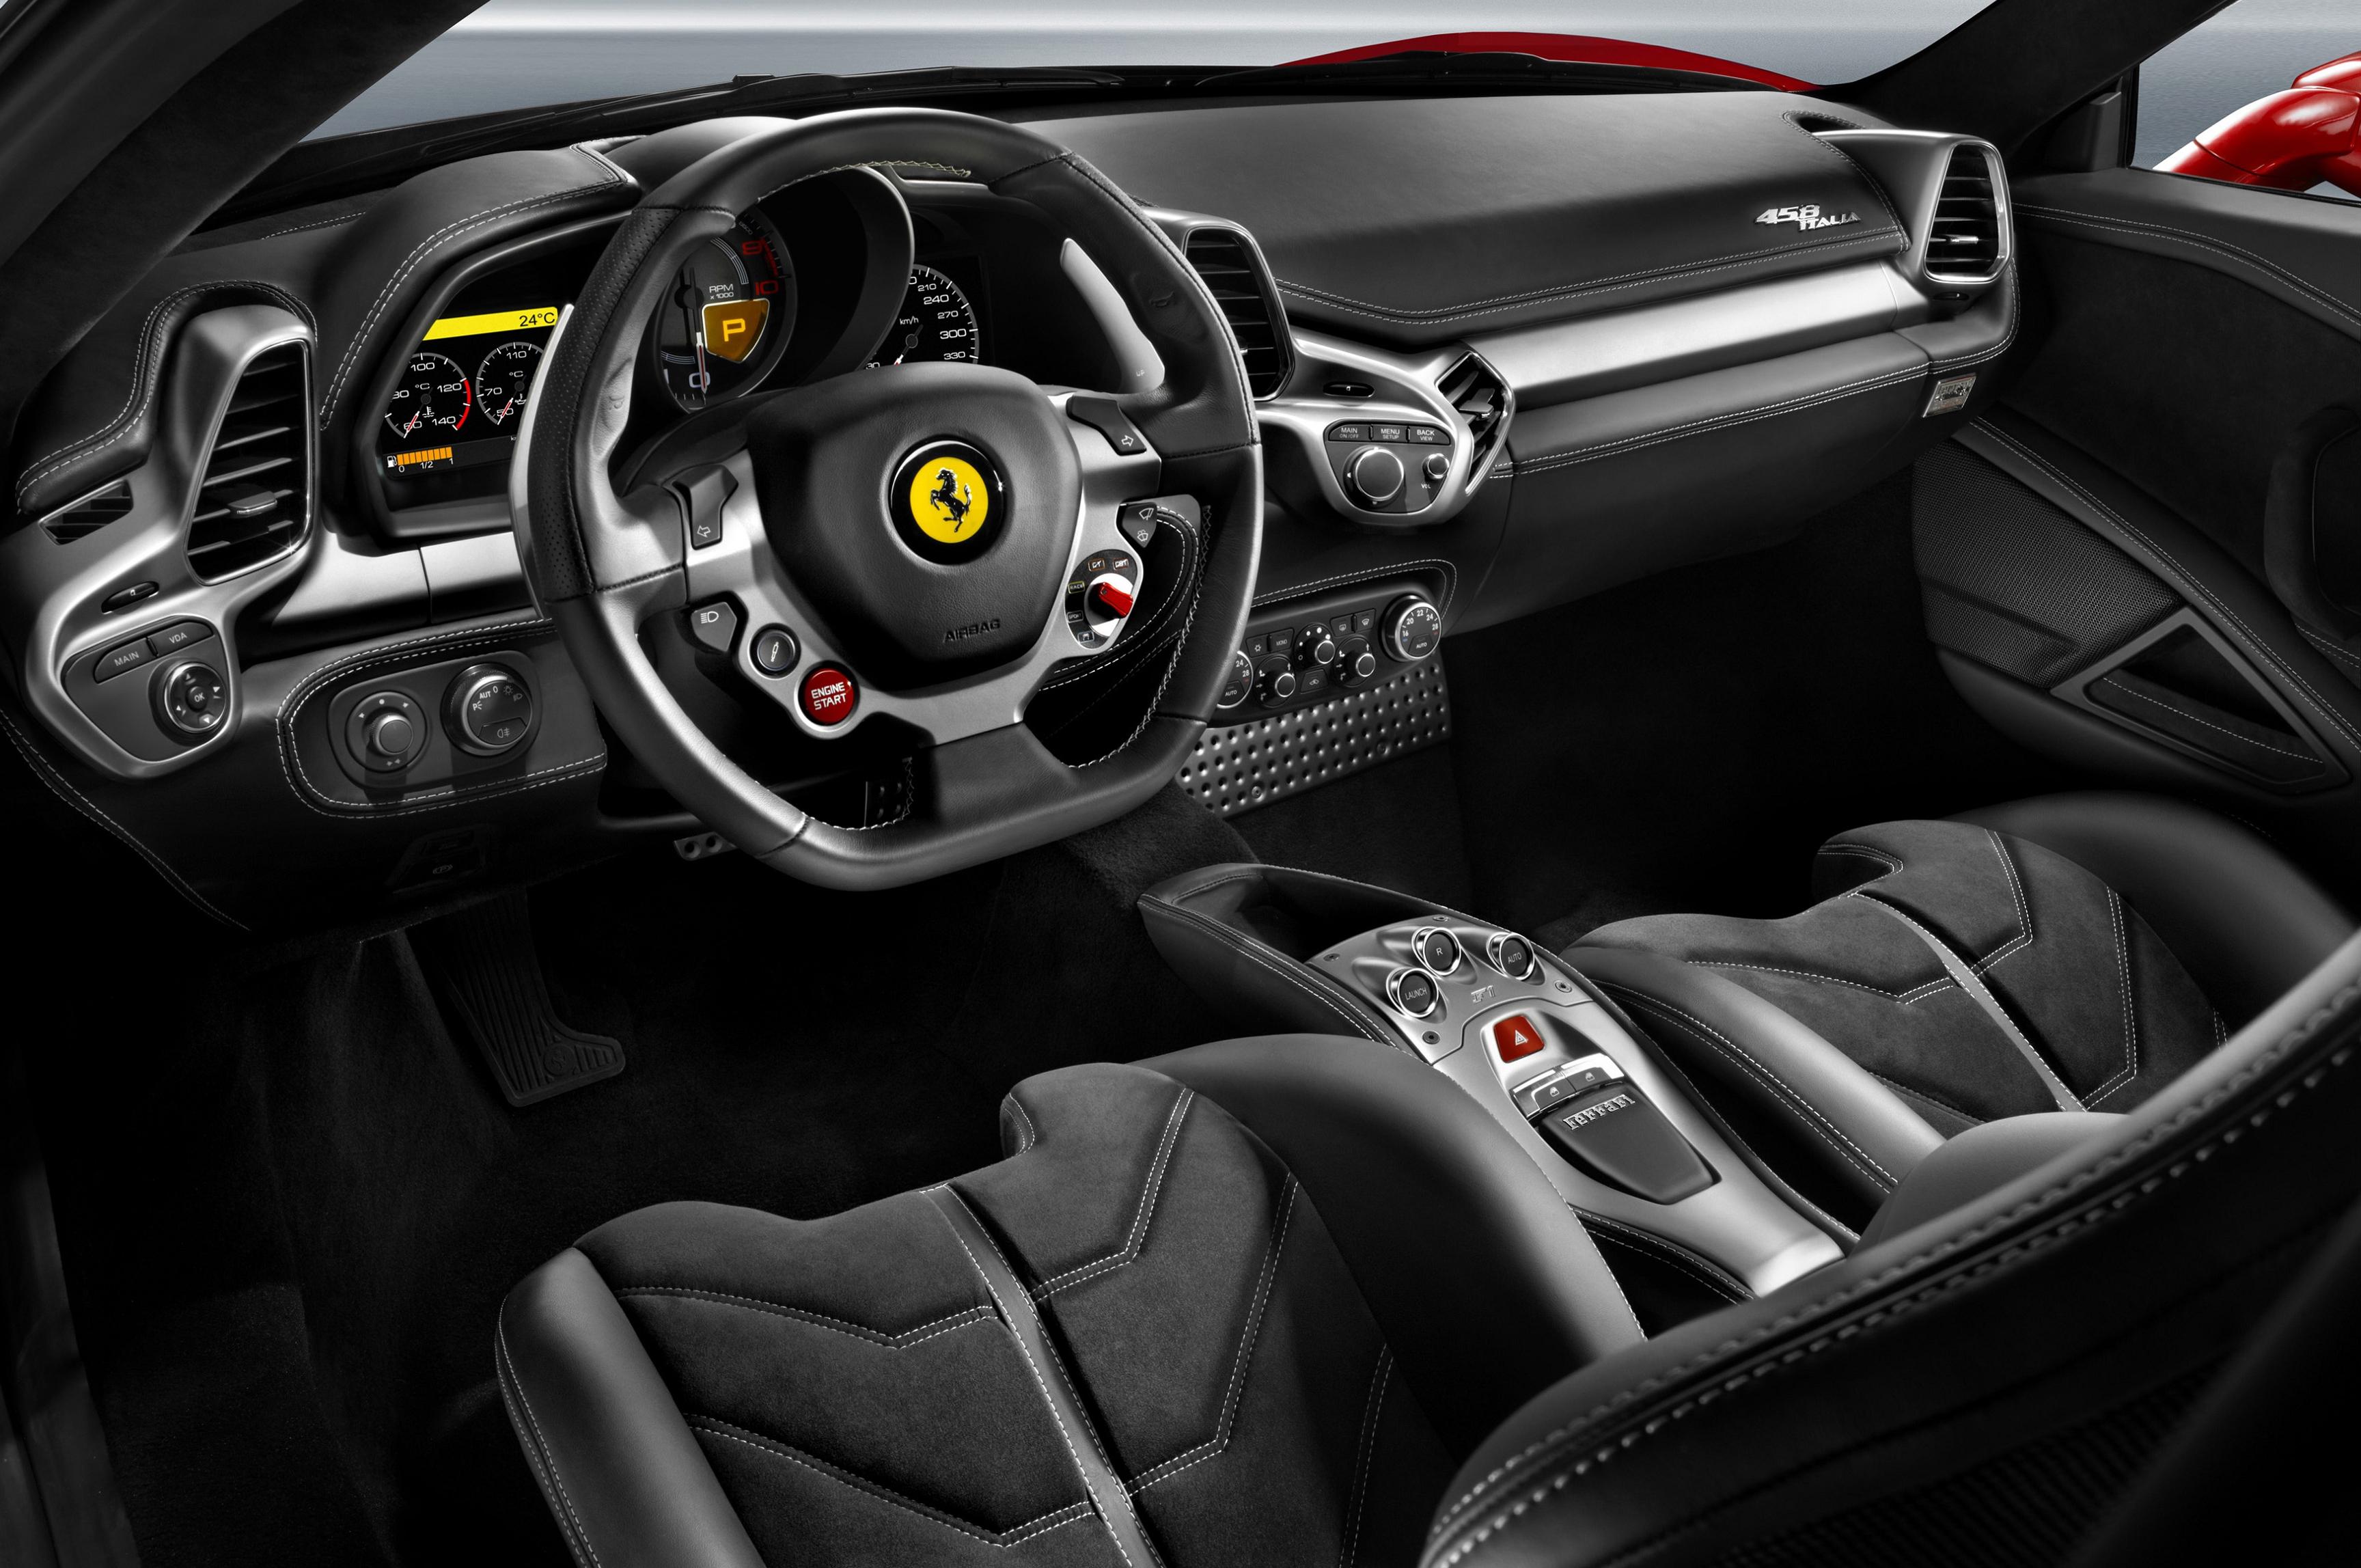 https://images.caradisiac.com/logos/1/4/8/6/181486/S0-Mondial-de-Paris-2014-La-Ferrari-M458-T-y-sera-97318.jpg